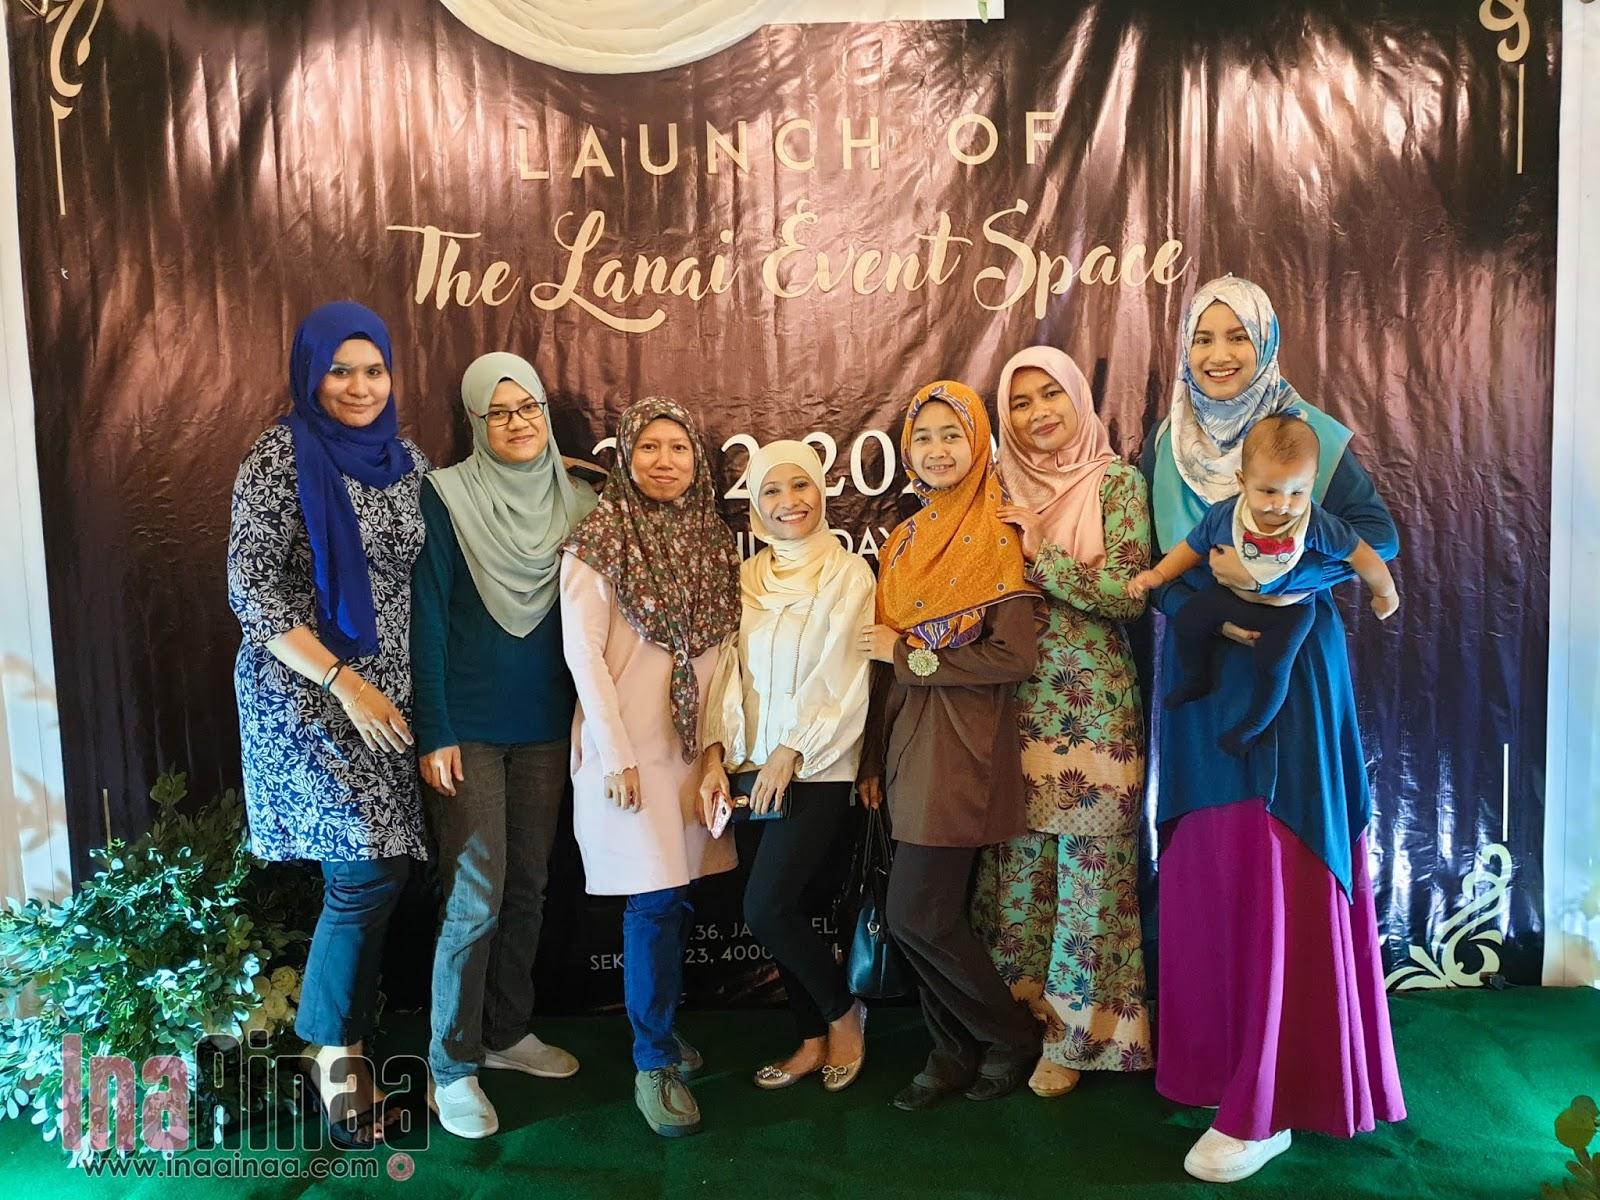 THE LANAI EVENT SPACE - Hak Milik Ina Ainaa